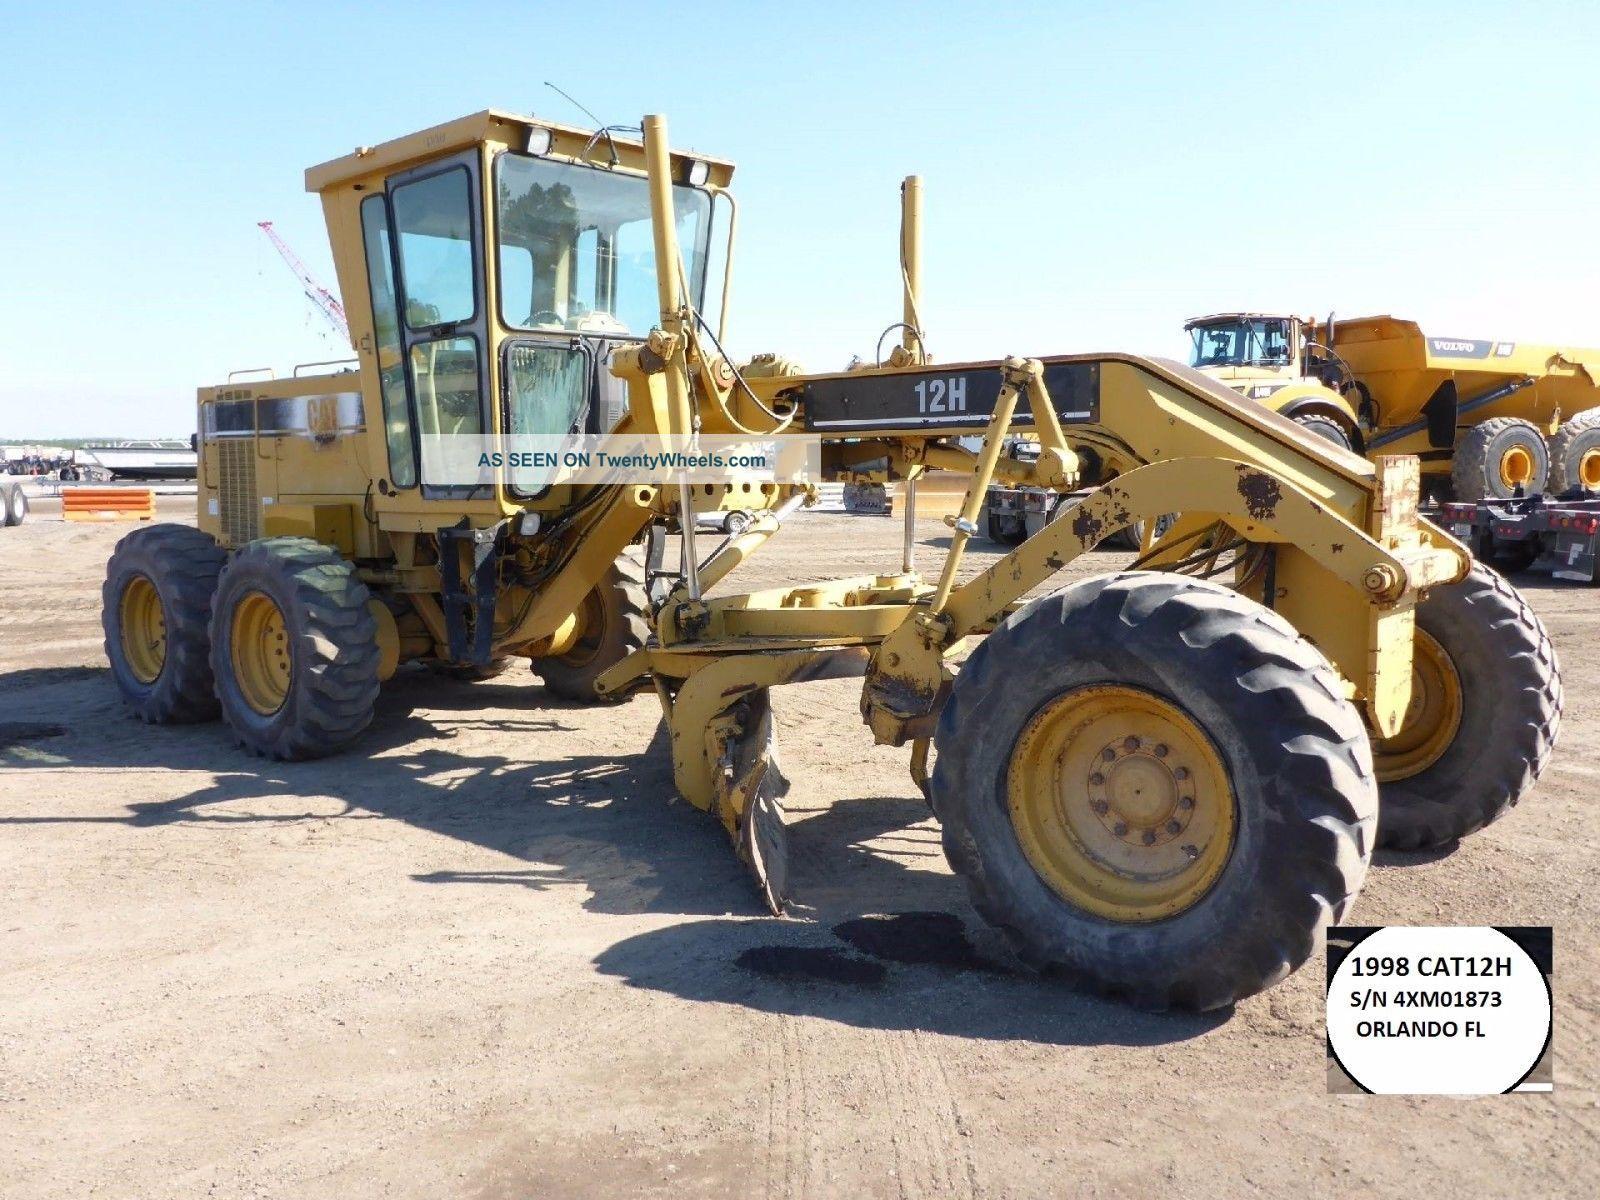 1998 Cat 12h Grader,  14ft Mb,  Ac,  Good Tires,  Runs Good $53500 - Orlando Fl See more 1998 CAT 12h Grader 14ft MB AC Good Tires Runs... photo